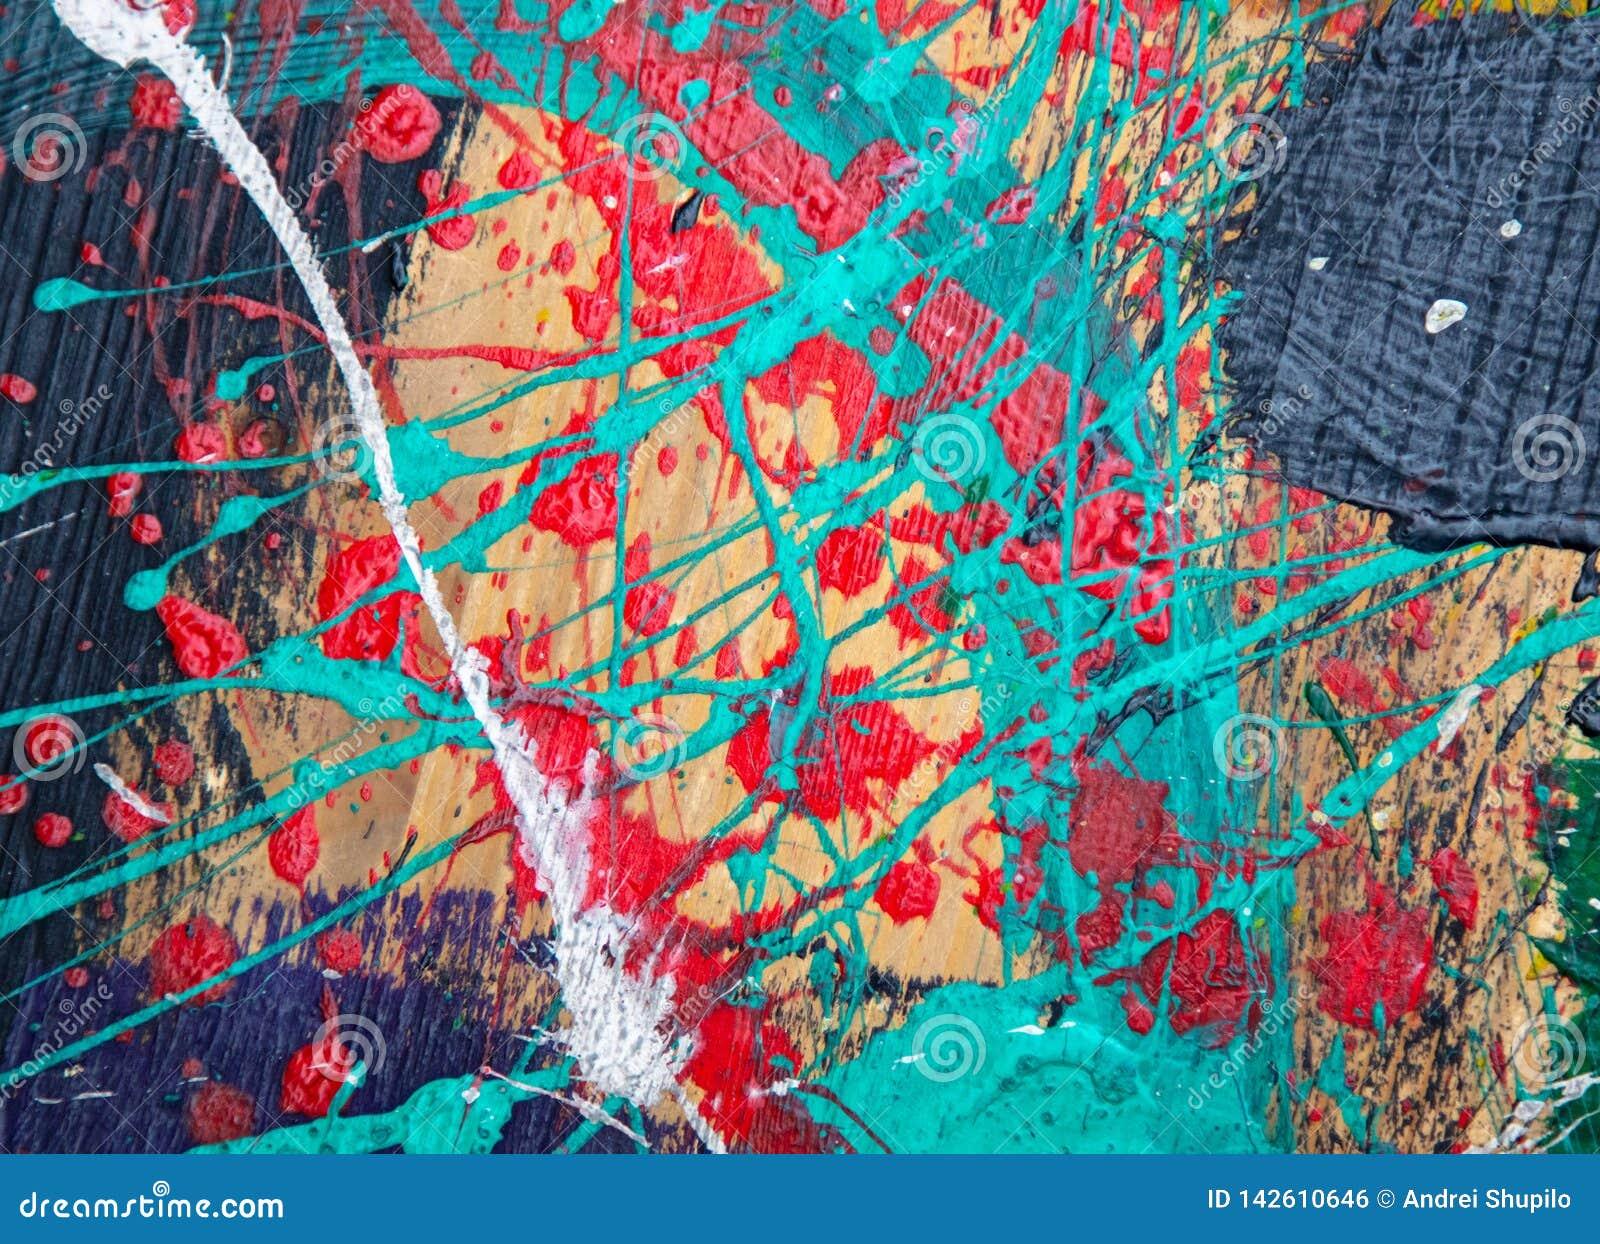 Olieverf op canvas als abstracte achtergrond